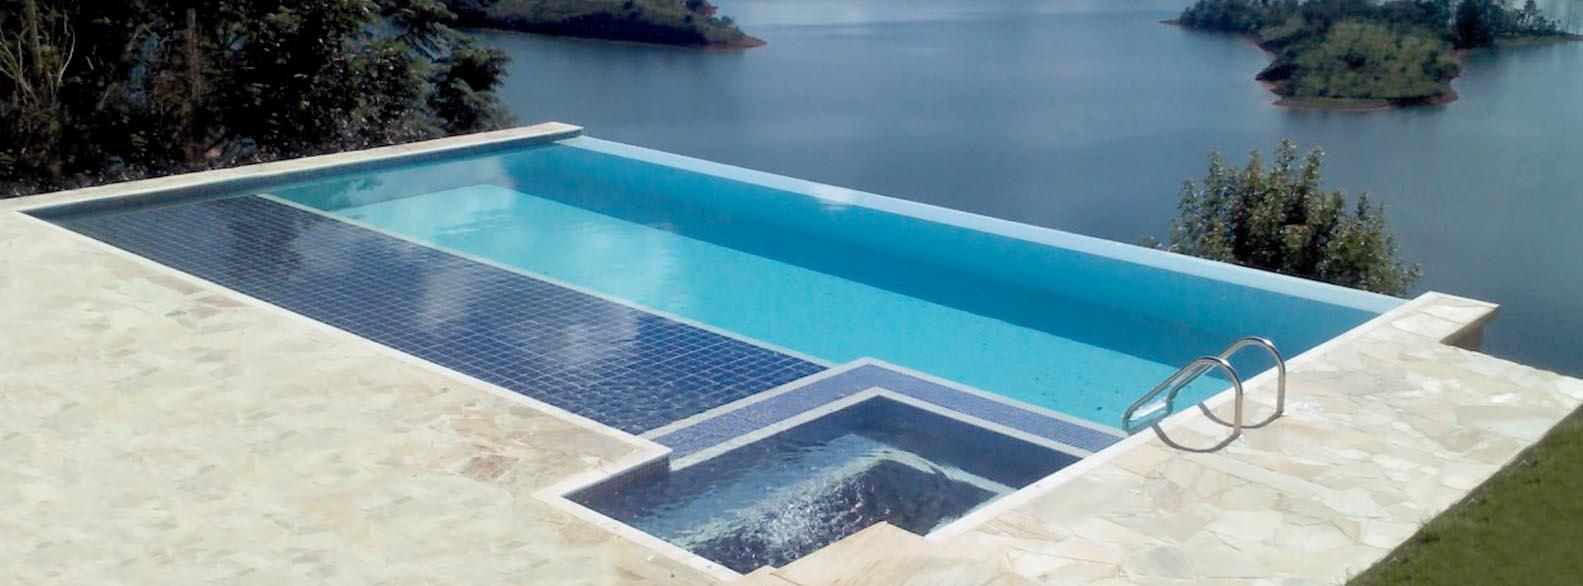 Piscina de azulejo piscina de concreto e piscina de alvenaria for Modelos de piscinas campestres